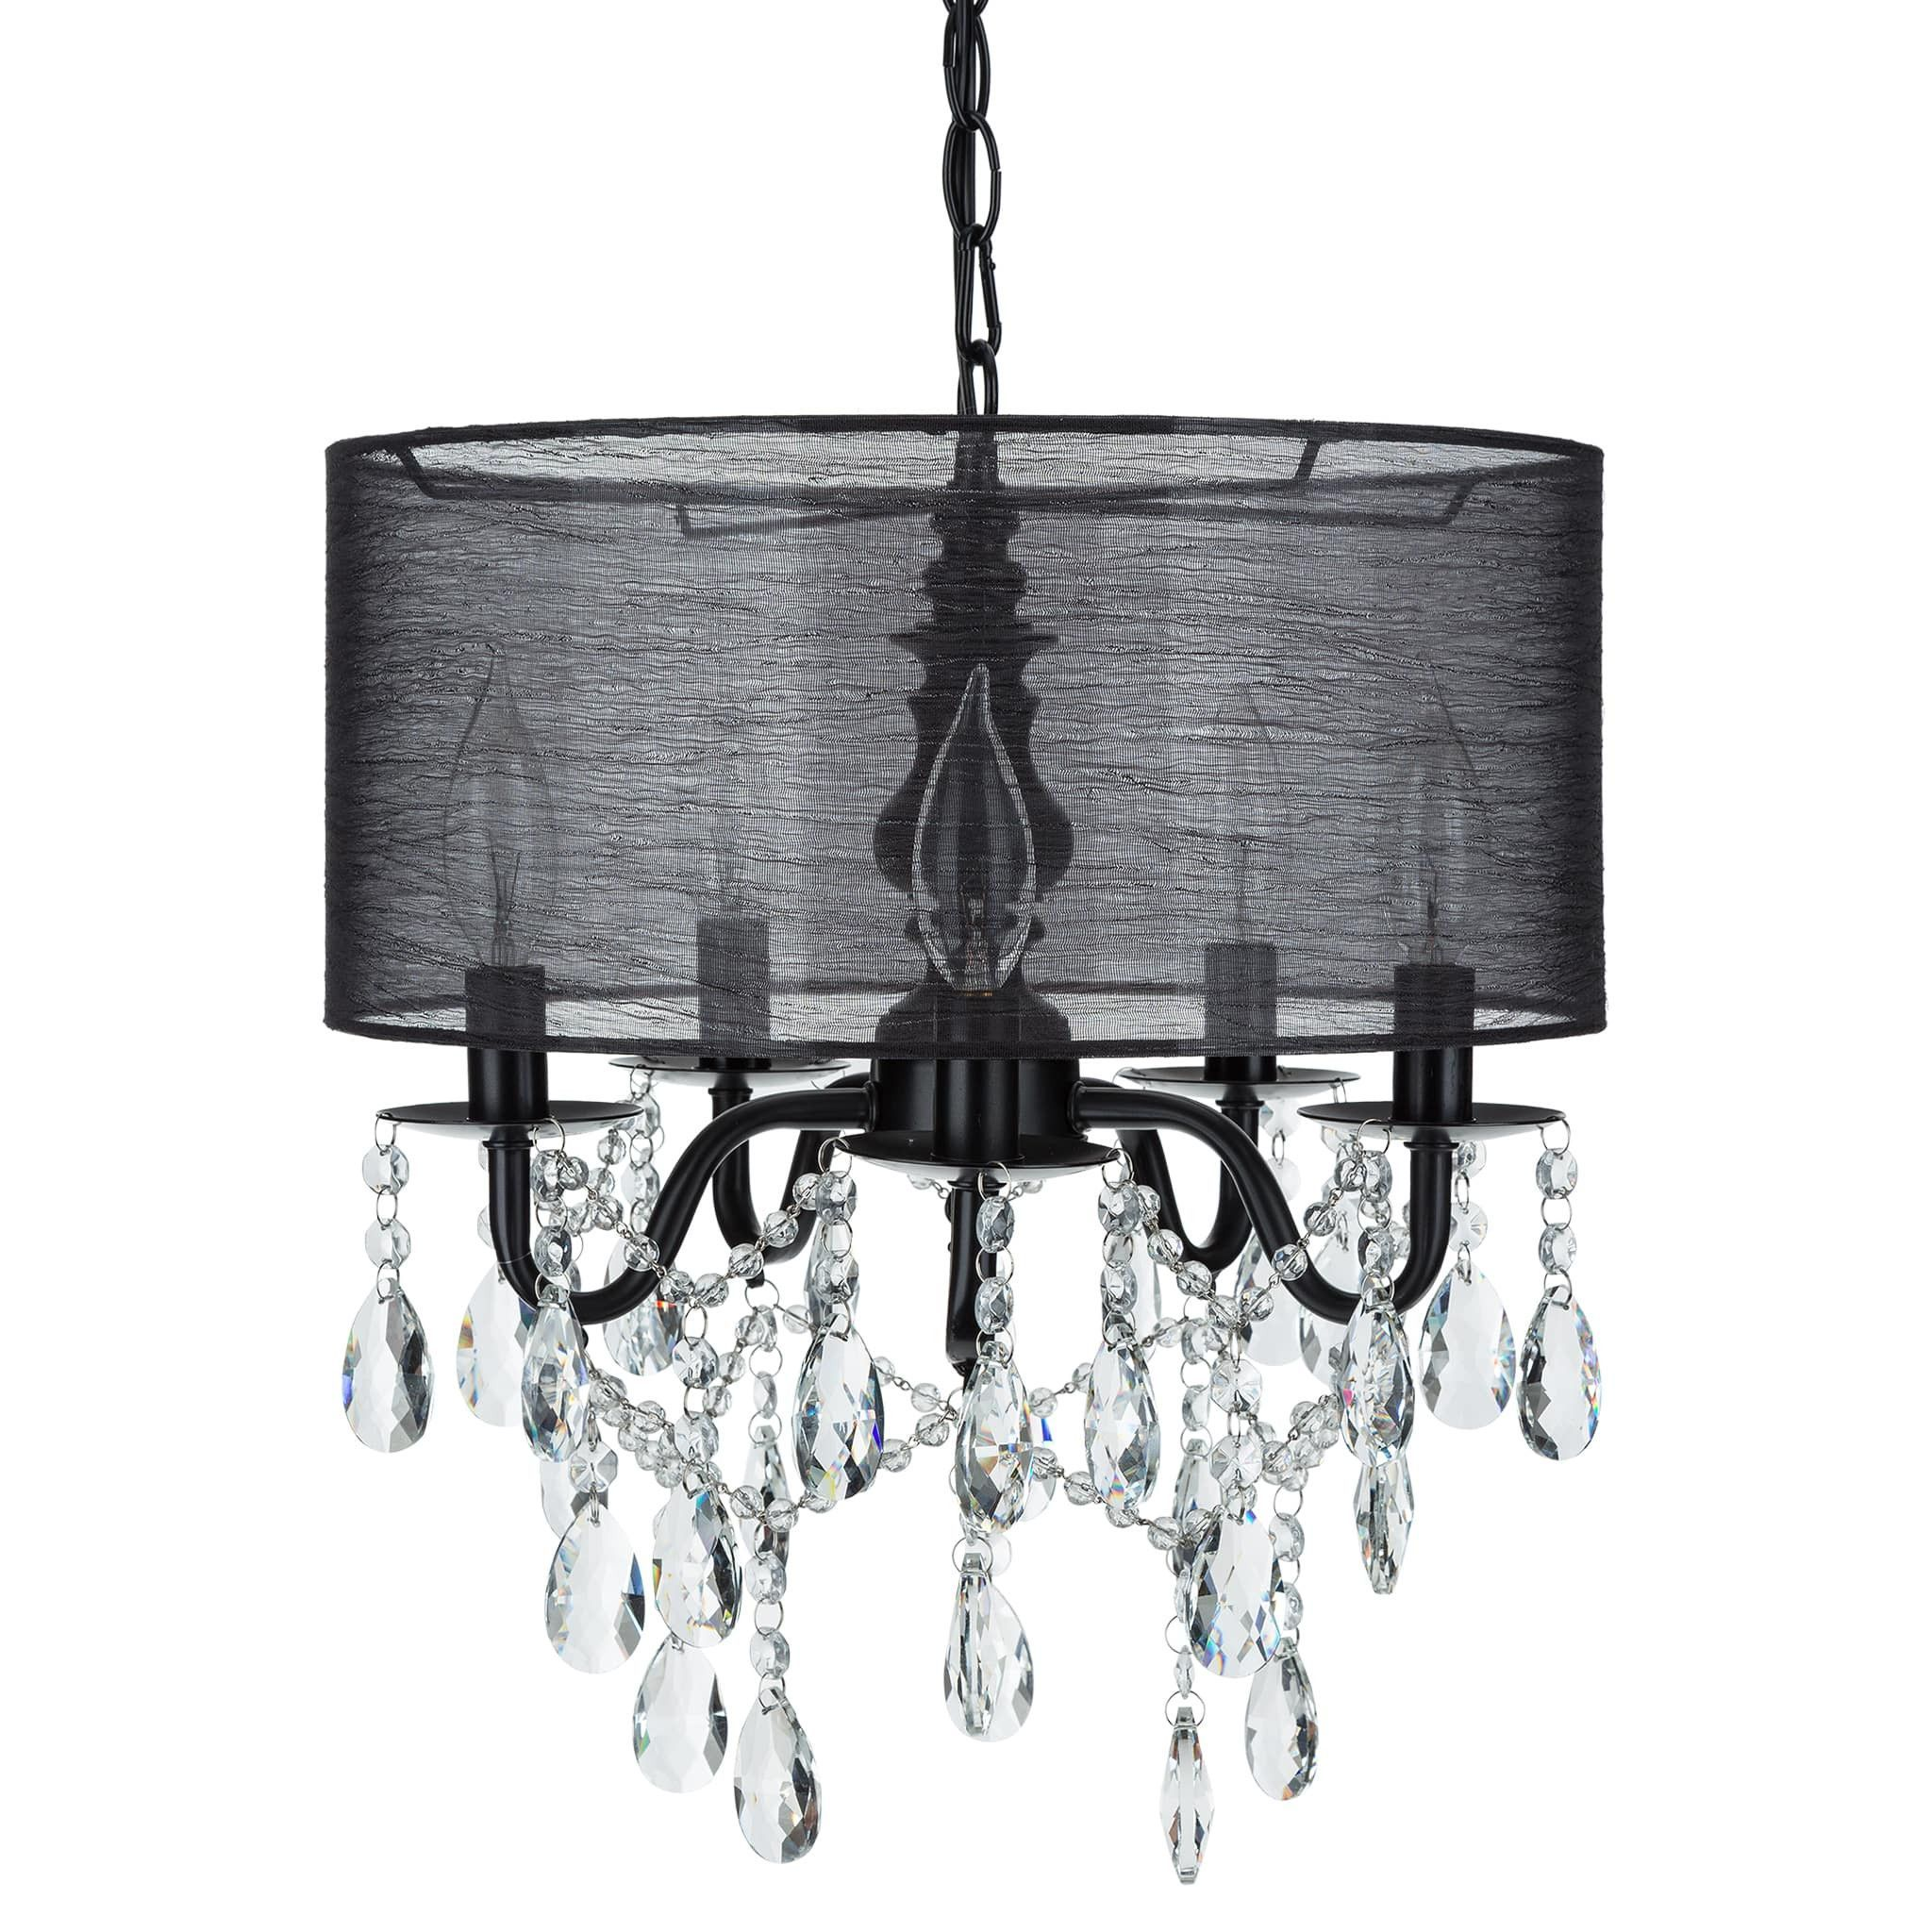 5 light crystal plug in chandelier with cylinder shade black 5 light crystal plug in chandelier with cylinder shade black luna collection arubaitofo Images